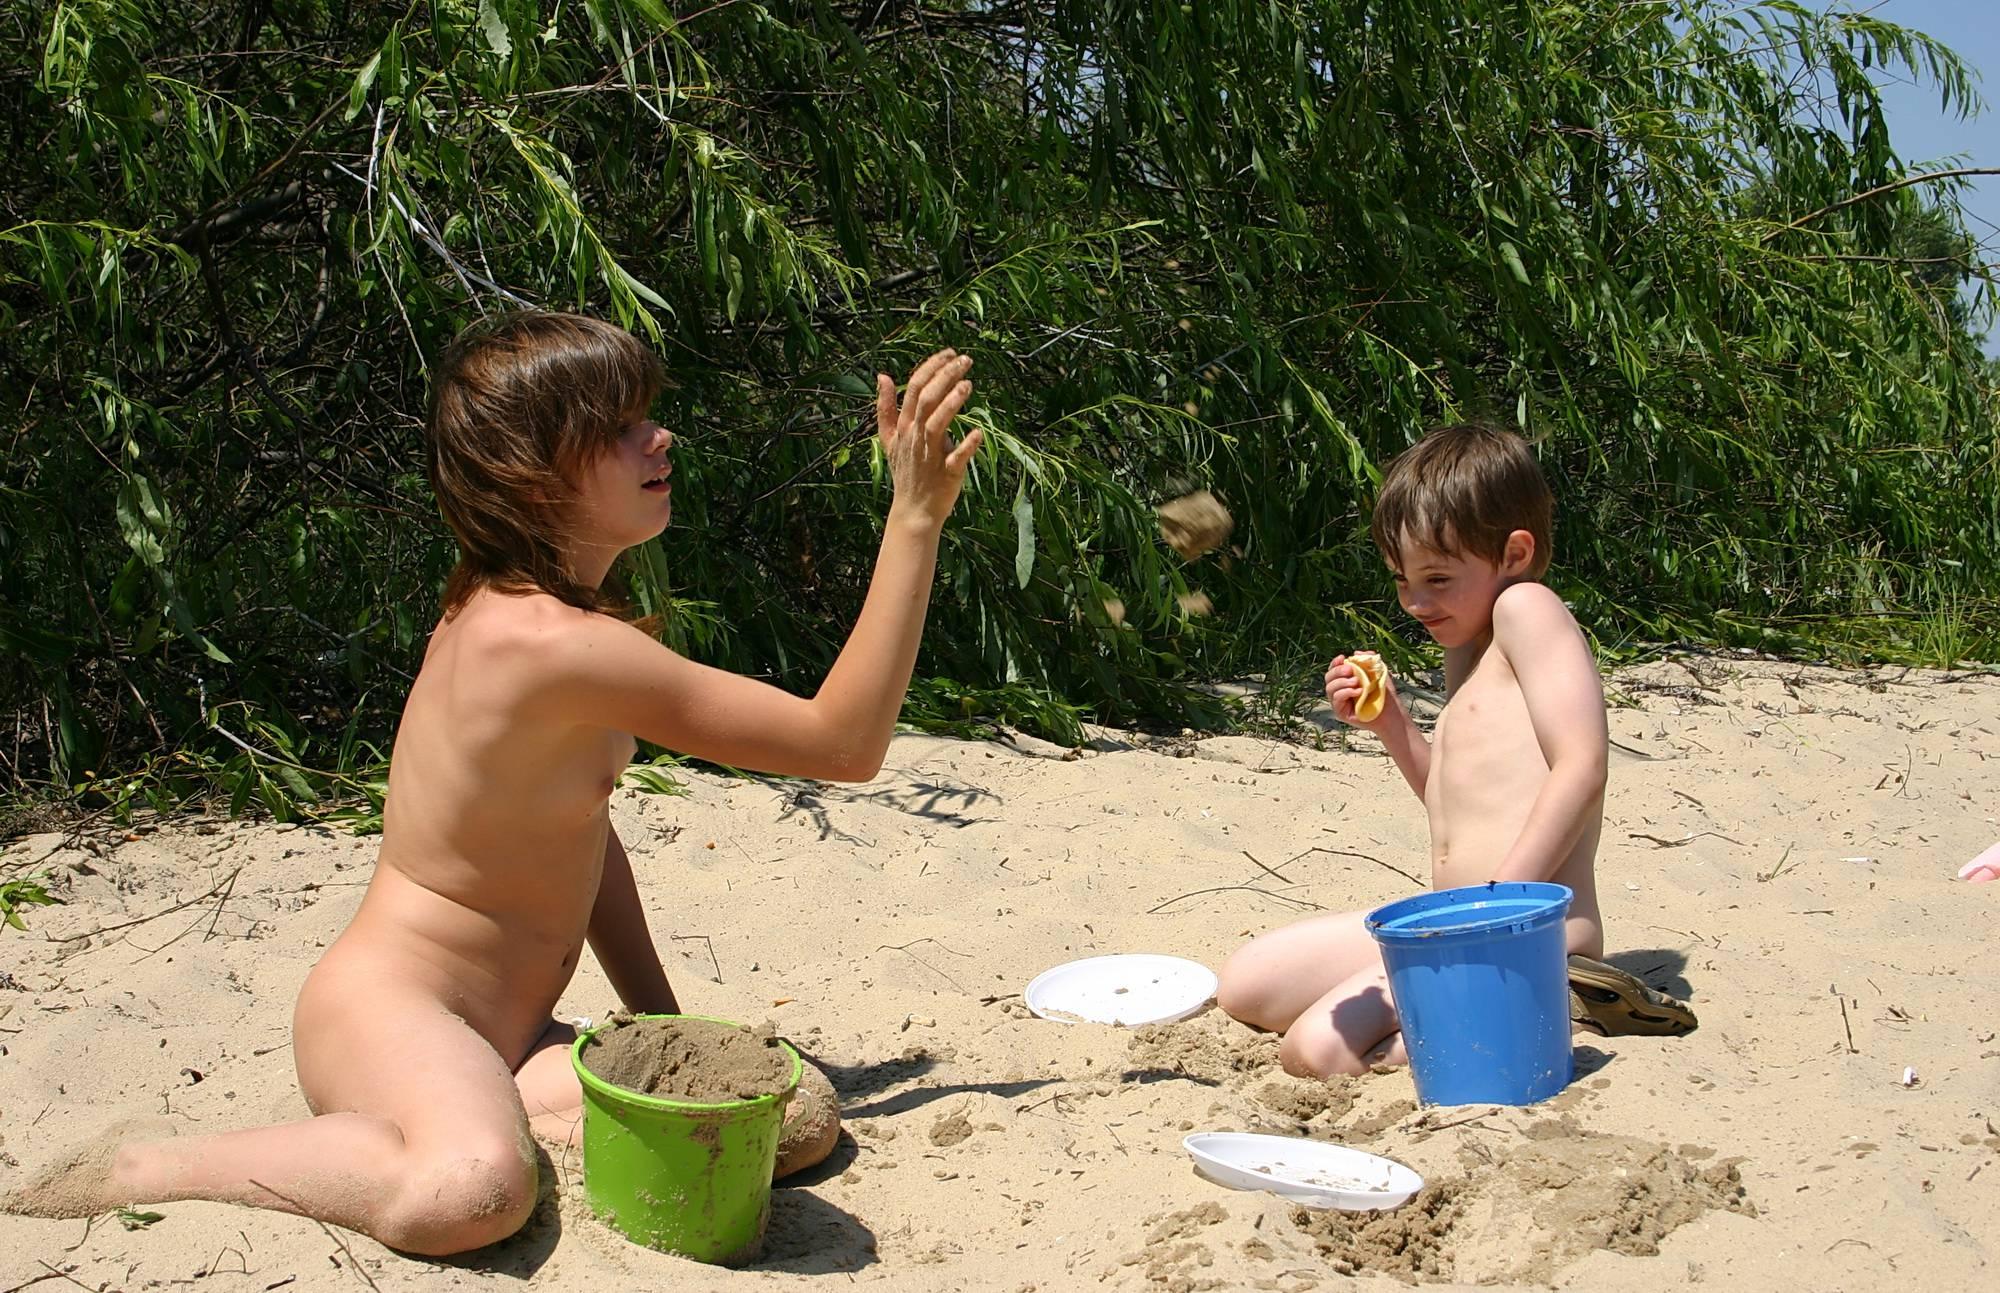 Nudist Gallery Outdoor Beach Sand Box - 1